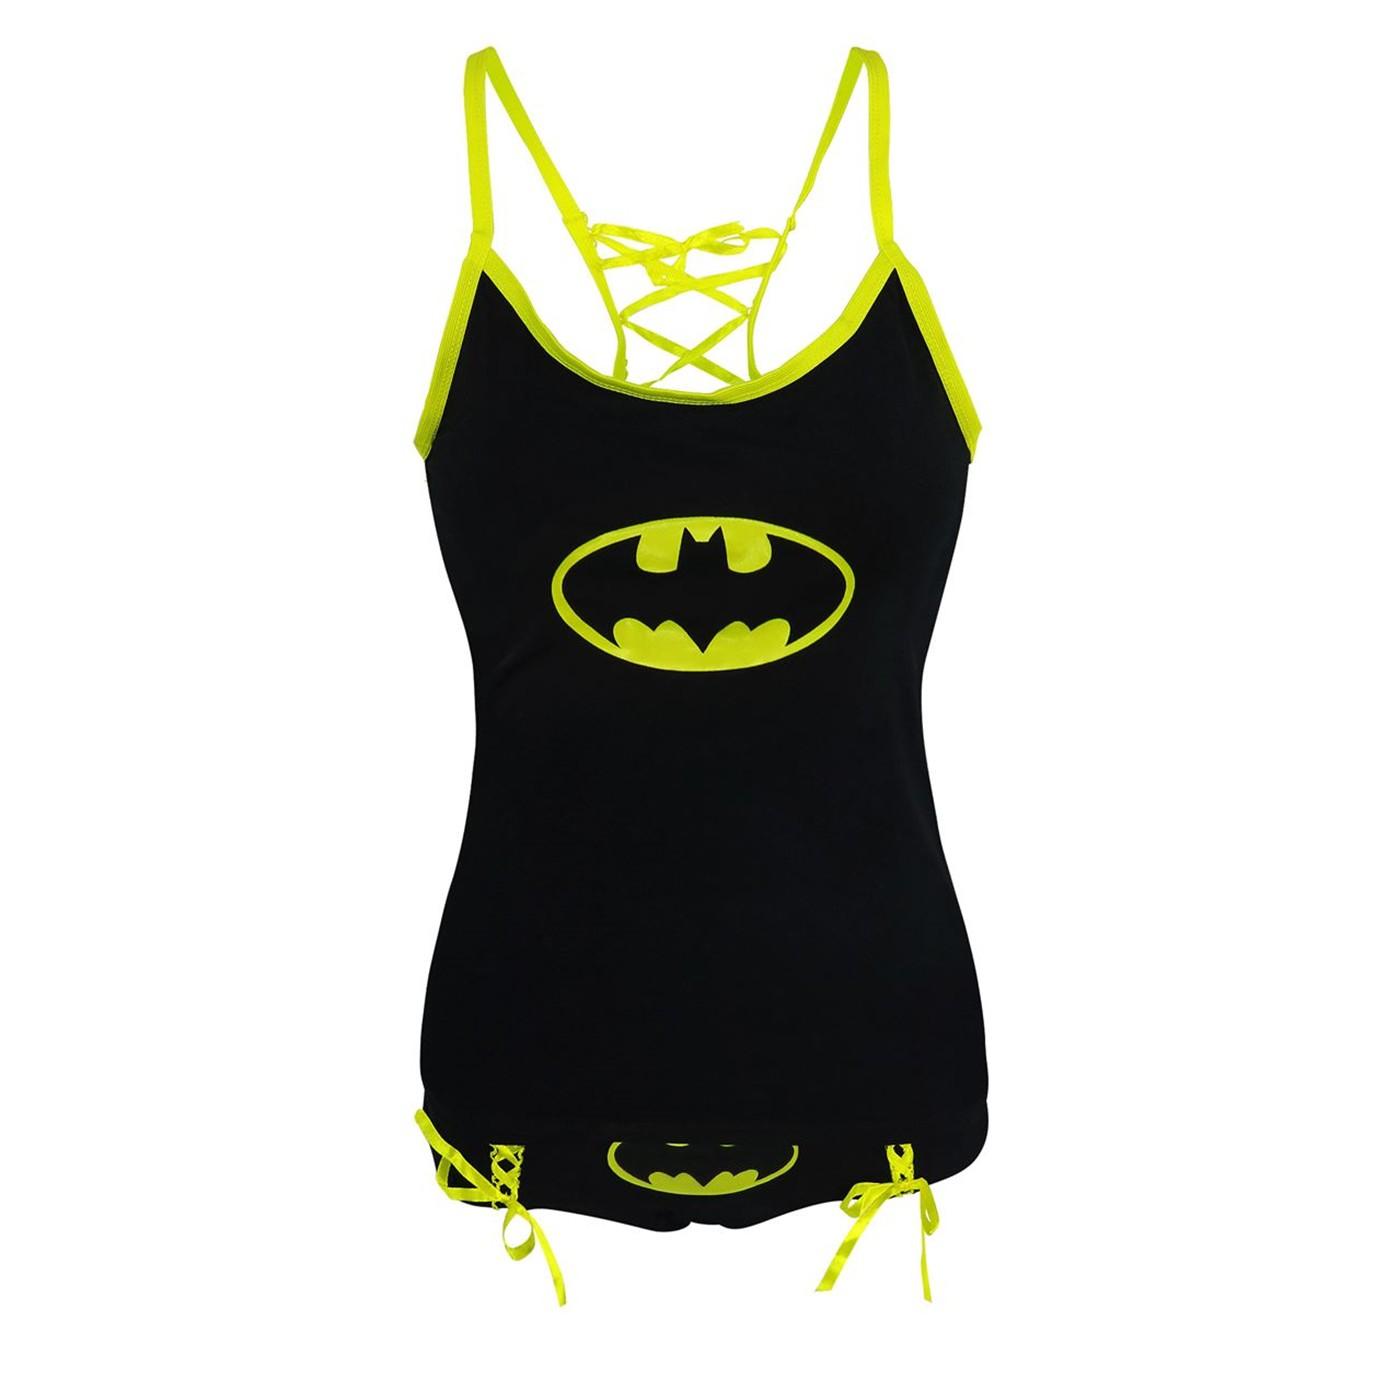 Batman Women's Camisole and Panty Set Glow in Dark